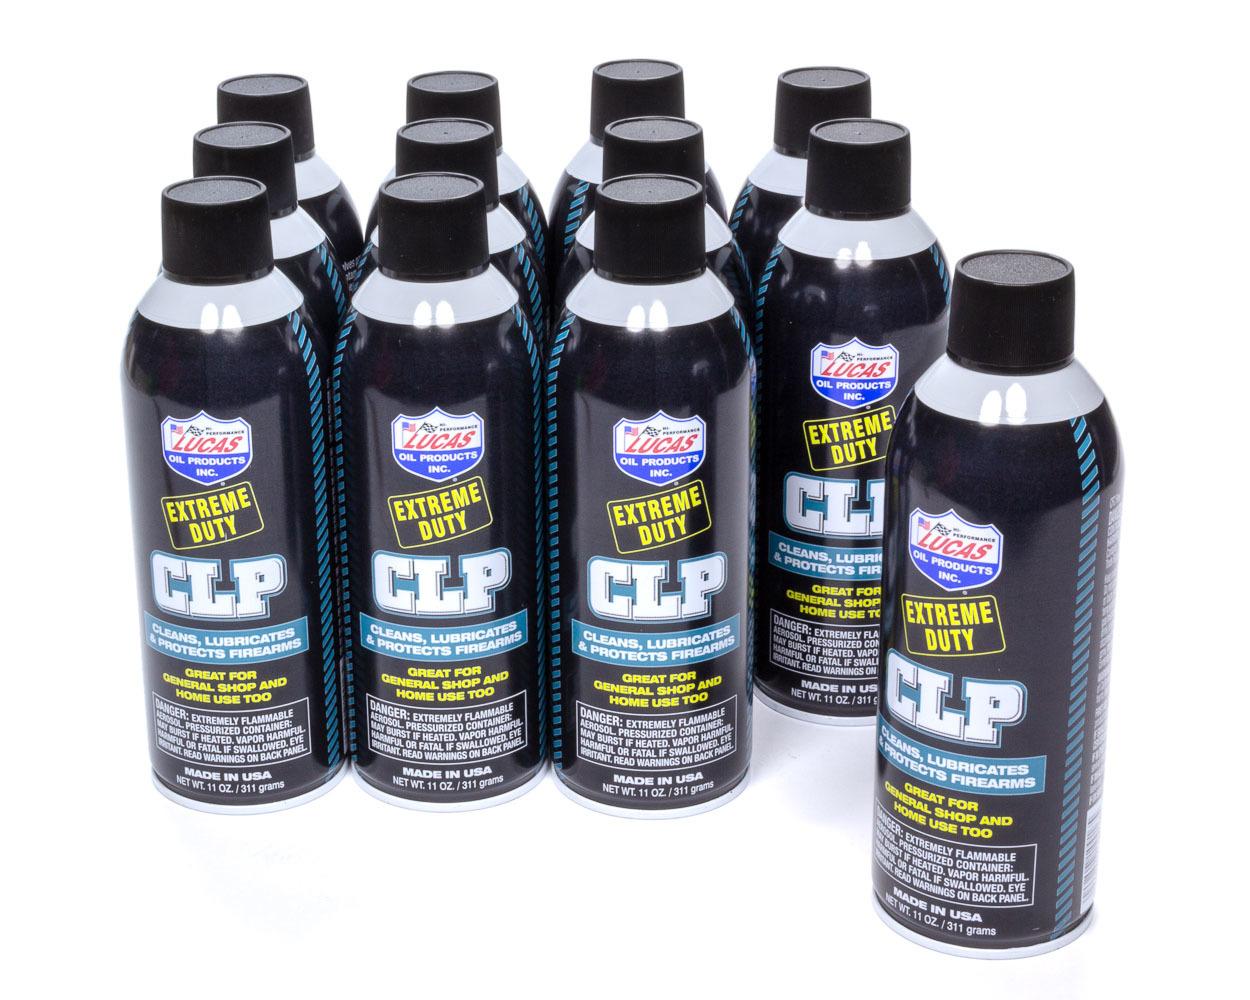 Extreme Duty CLP Aerosol Case 12 x 11 Ounce